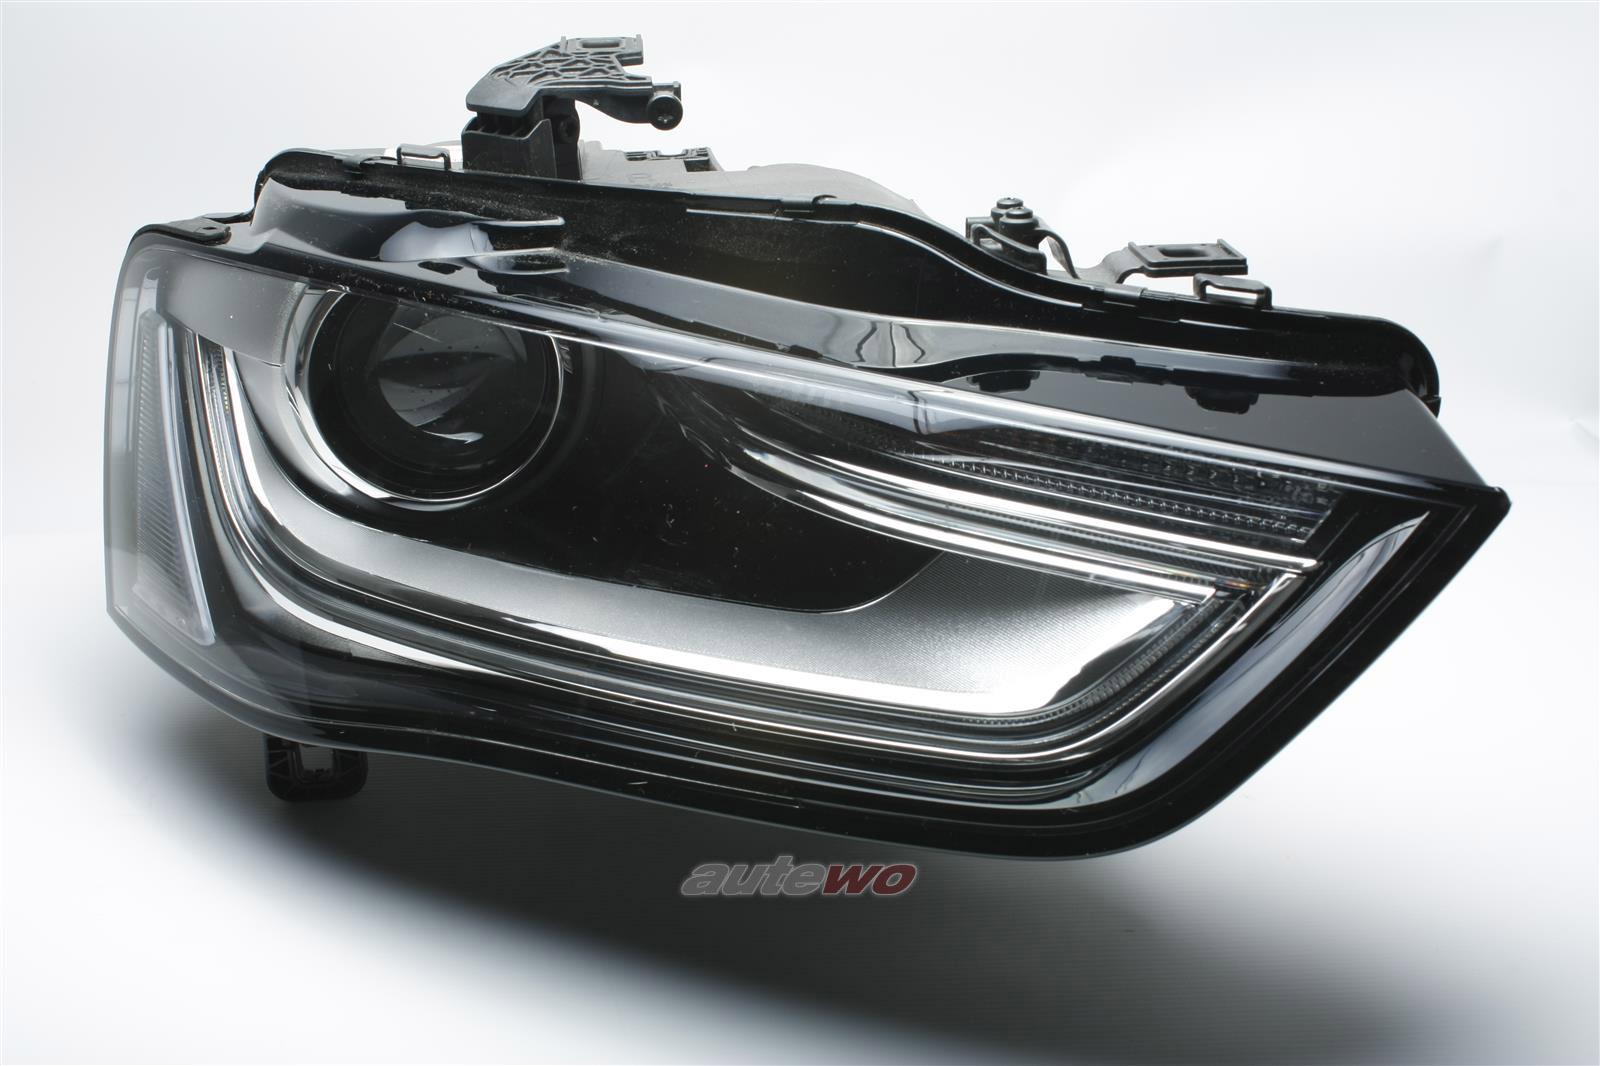 8K0941044C 8K0941006C NEU Audi A4/S4/RS4 8K BiXenon-Scheinwerfer LED Rechts